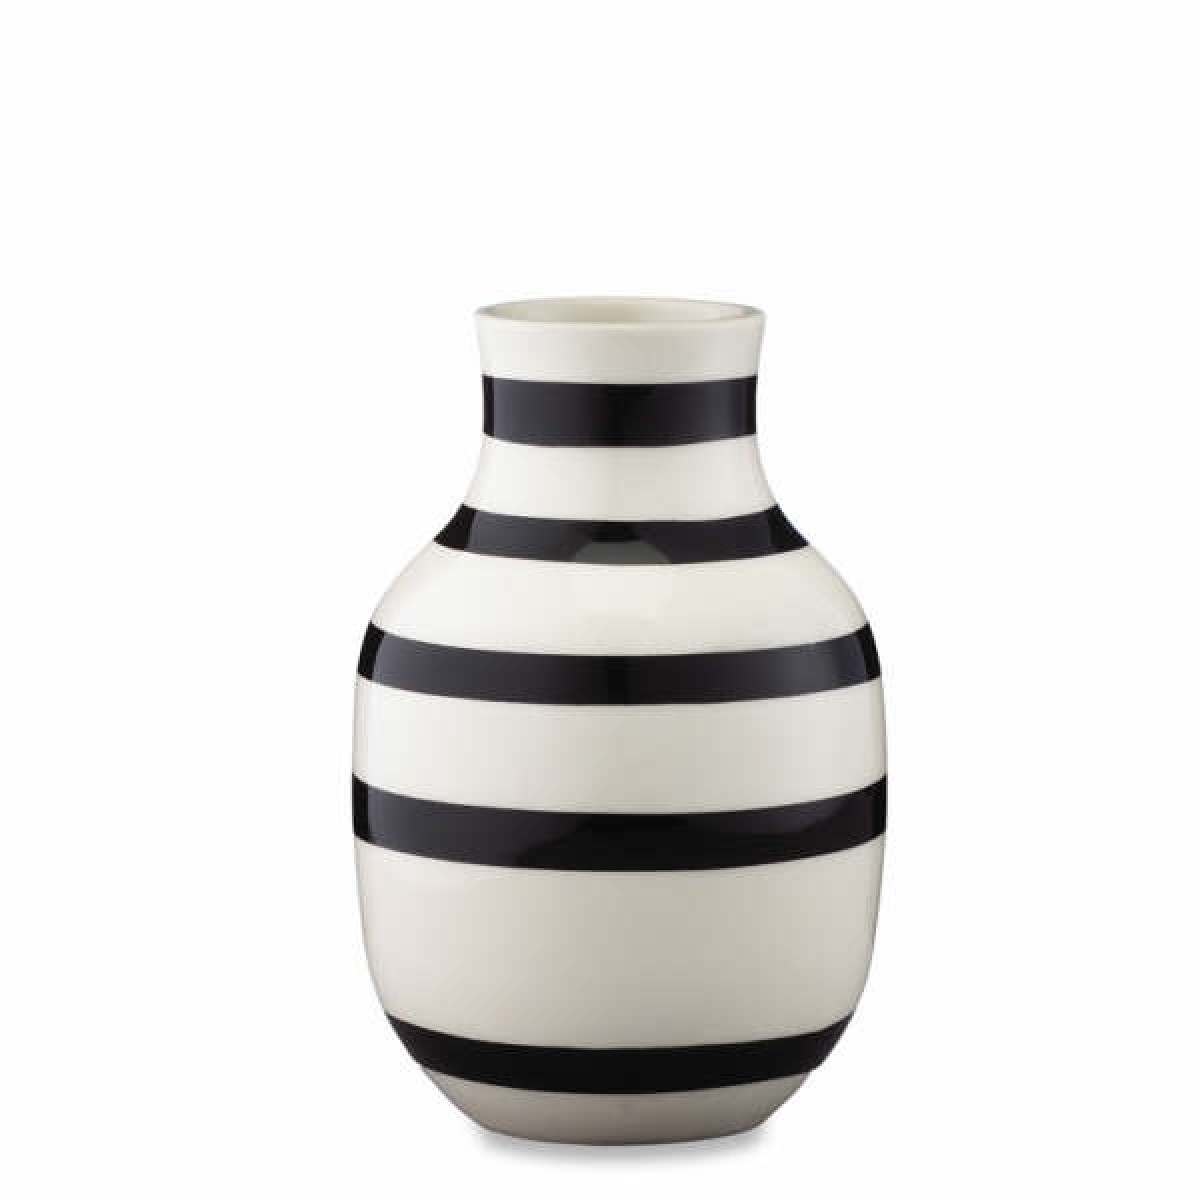 KÄHLER Omaggio vase sort 12,5 cm.